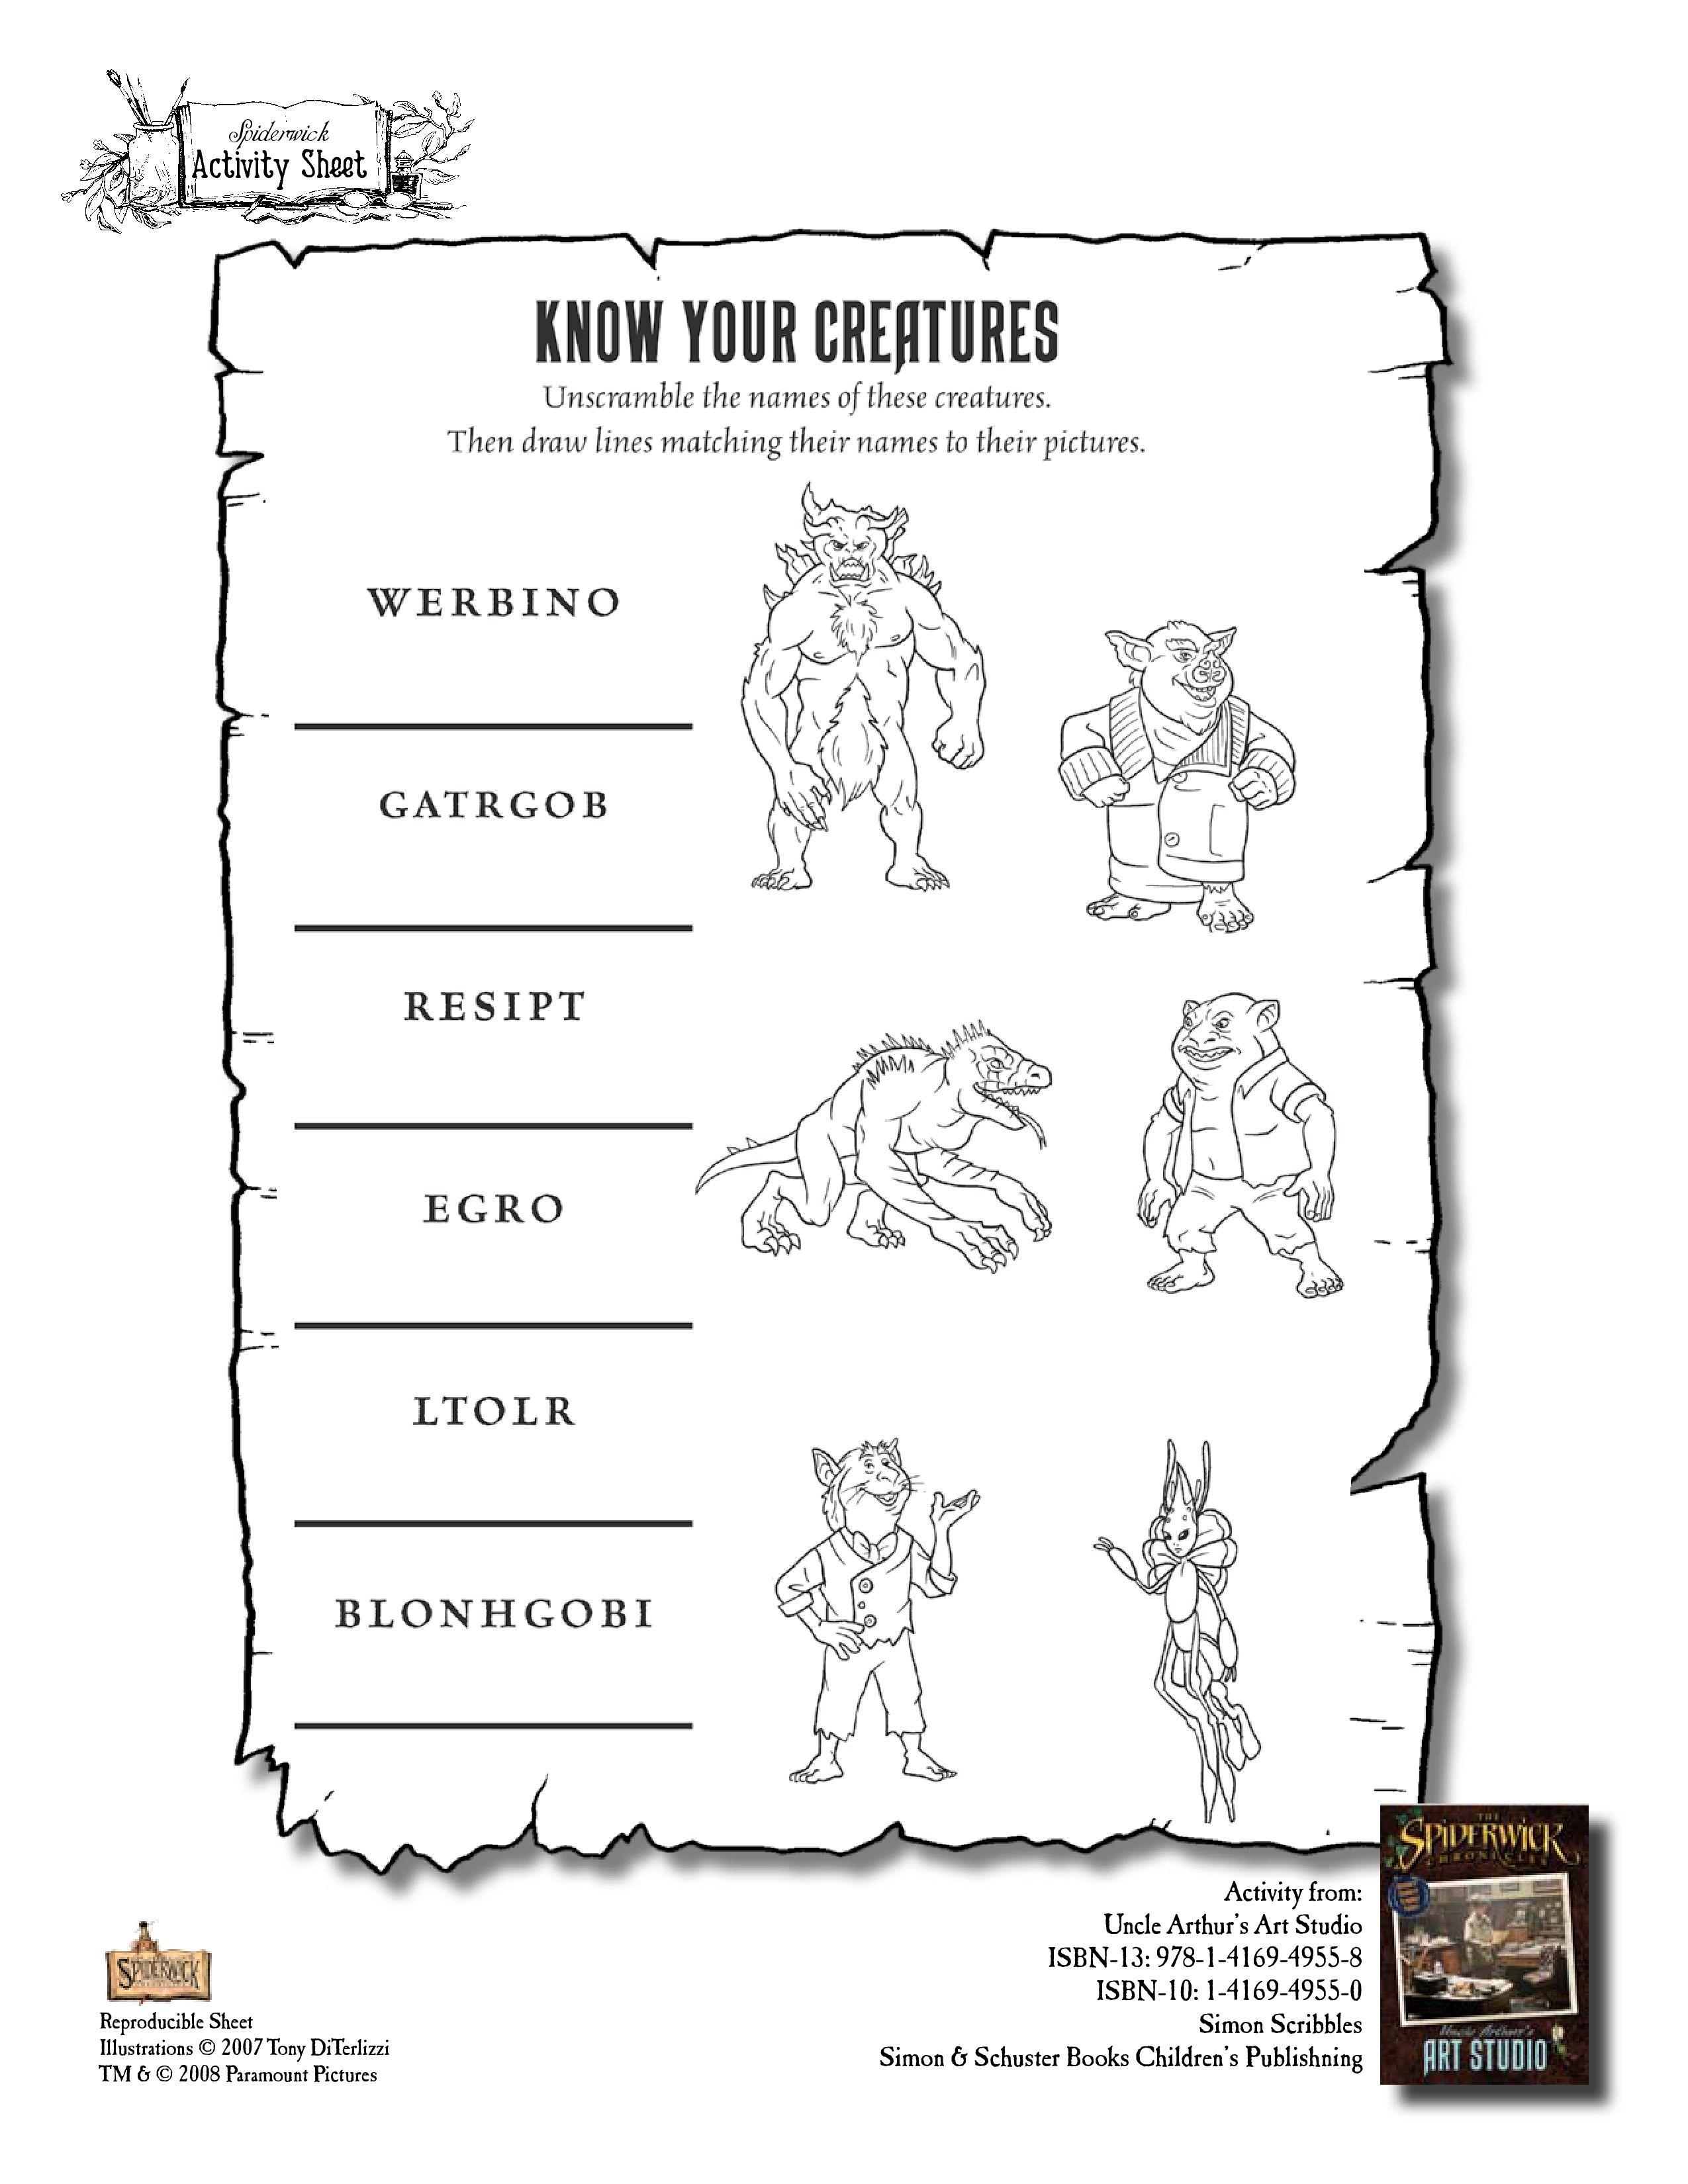 Spiderwick Chronicles Worksheet